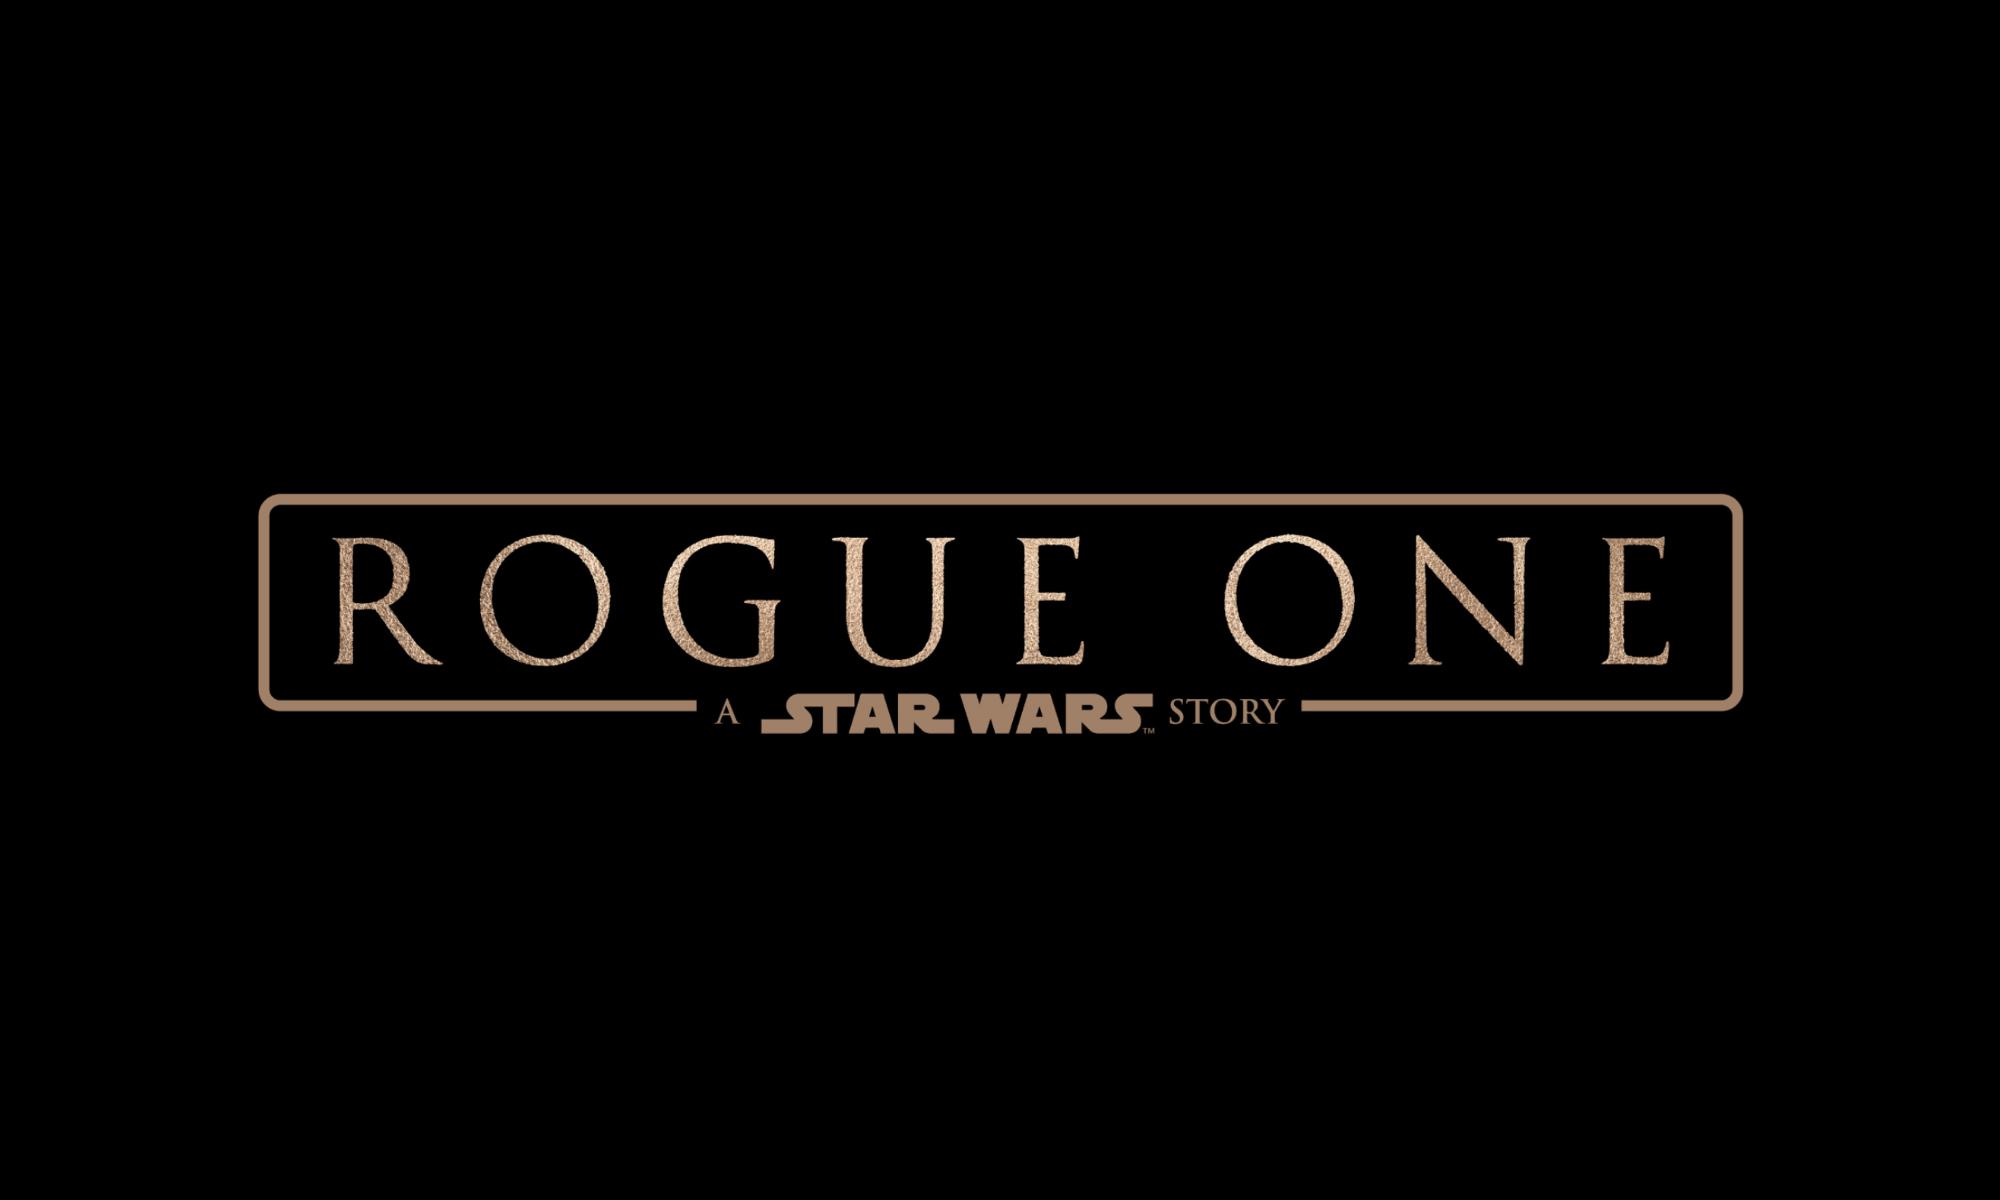 star-wars-rogue-one-movie-logo